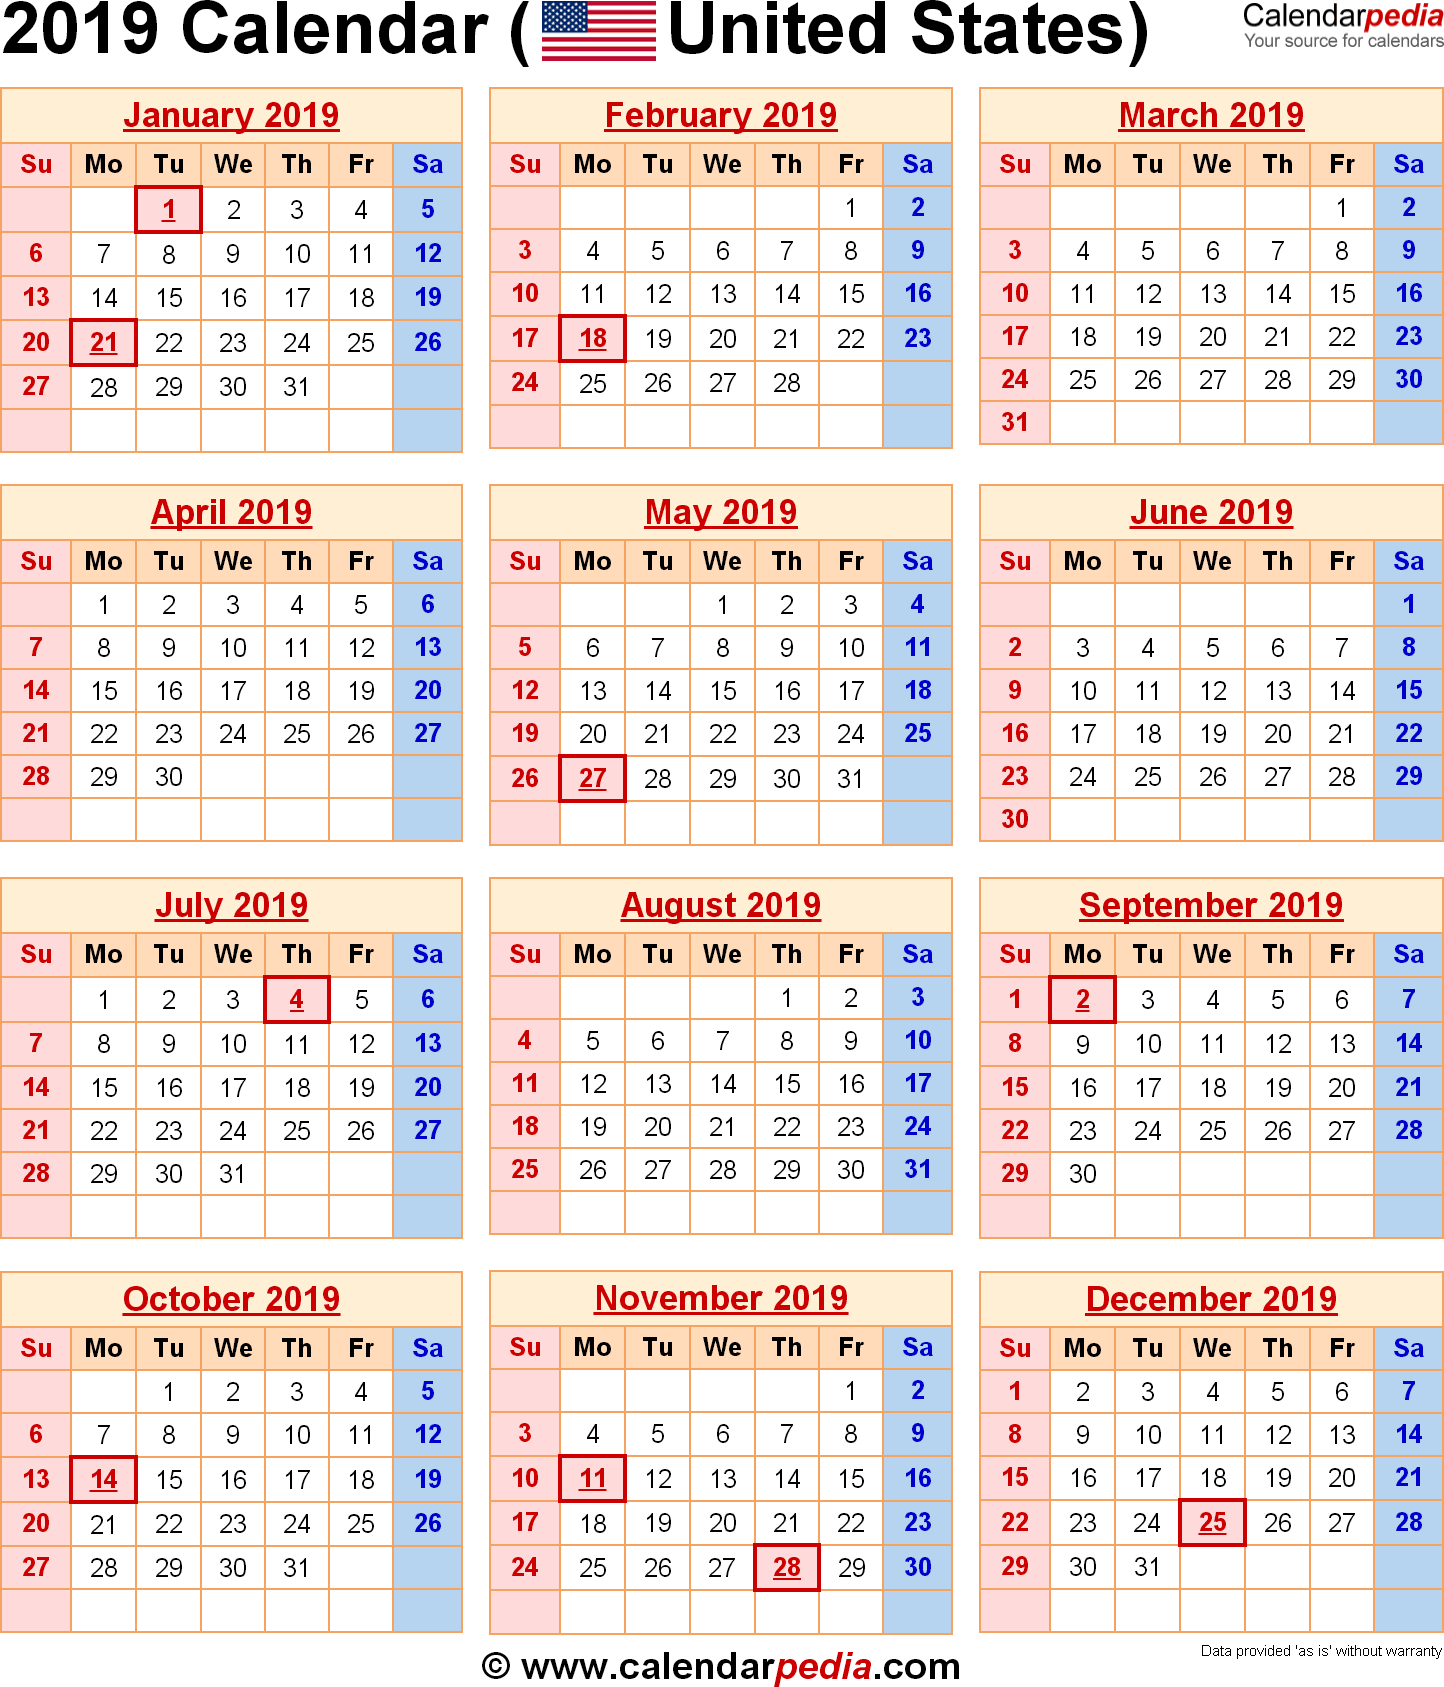 2019 Calendar United States | Us Federal Holidays | 2019 Calendar Us U.s. Calendar 2019